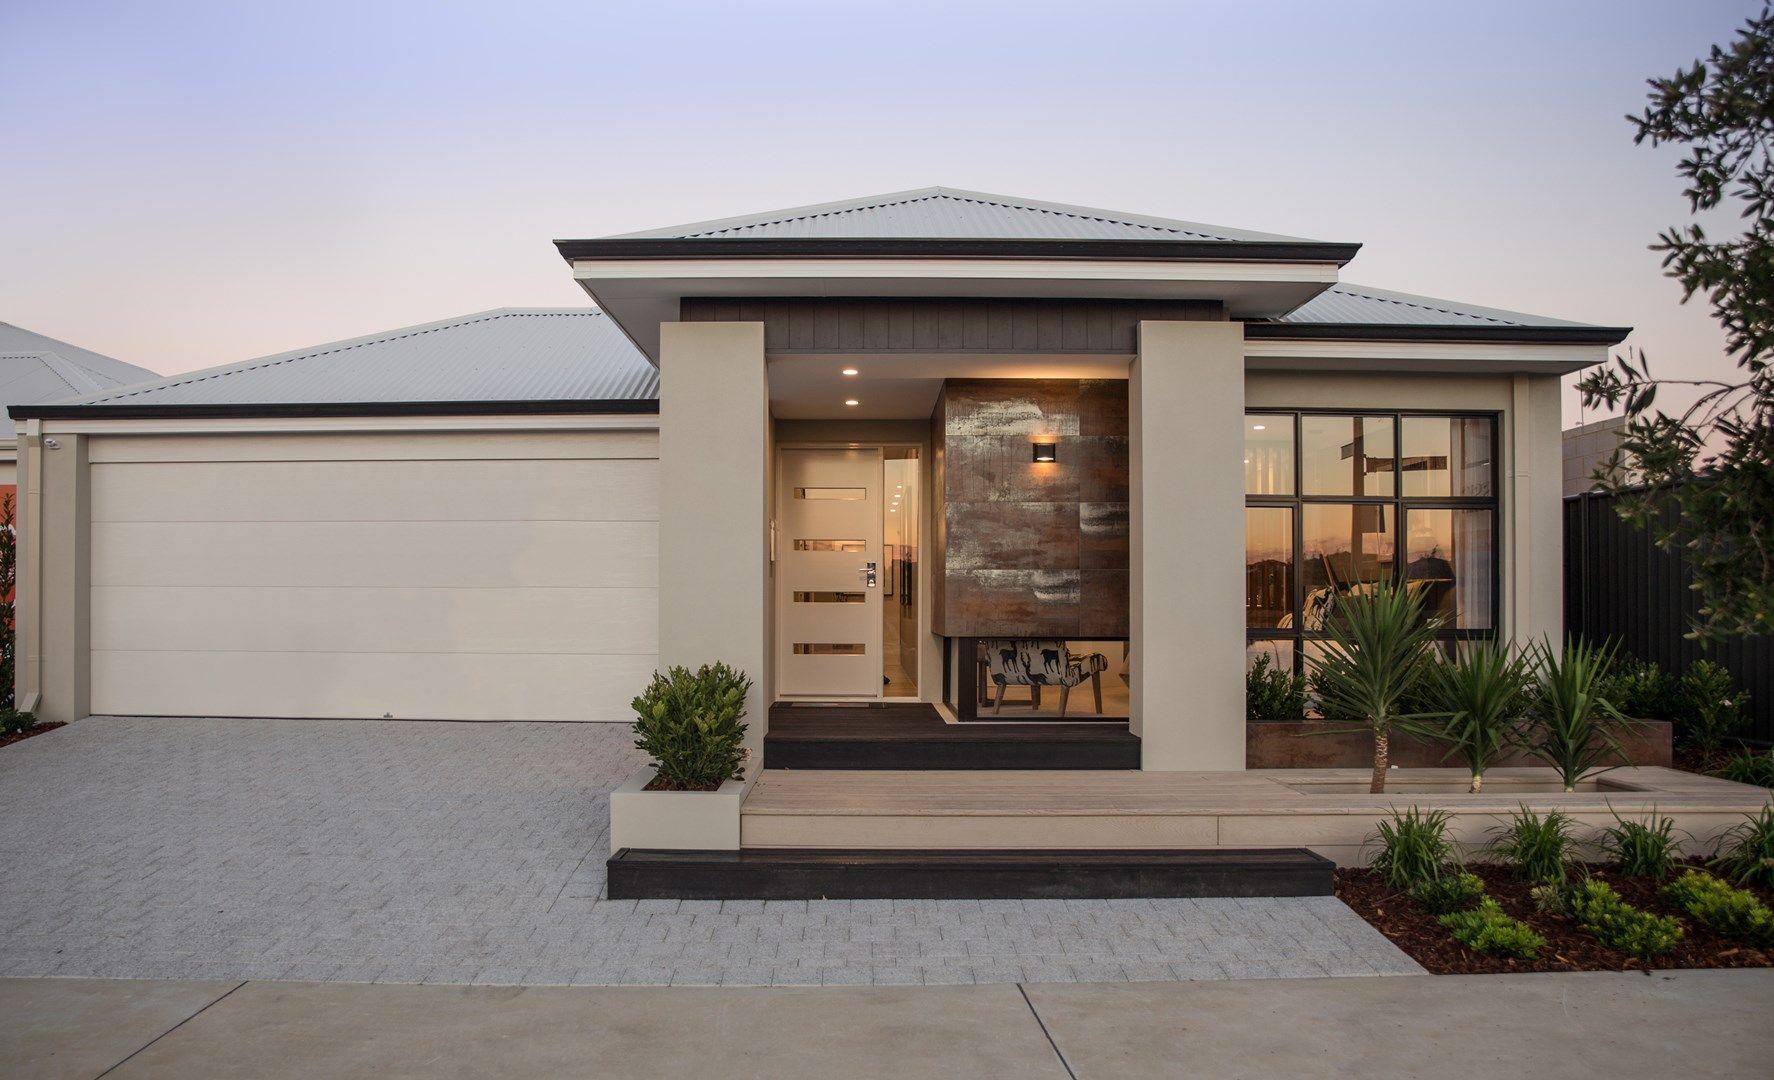 Lot 170 Treendale Riverside, Australind WA 6233, Image 1